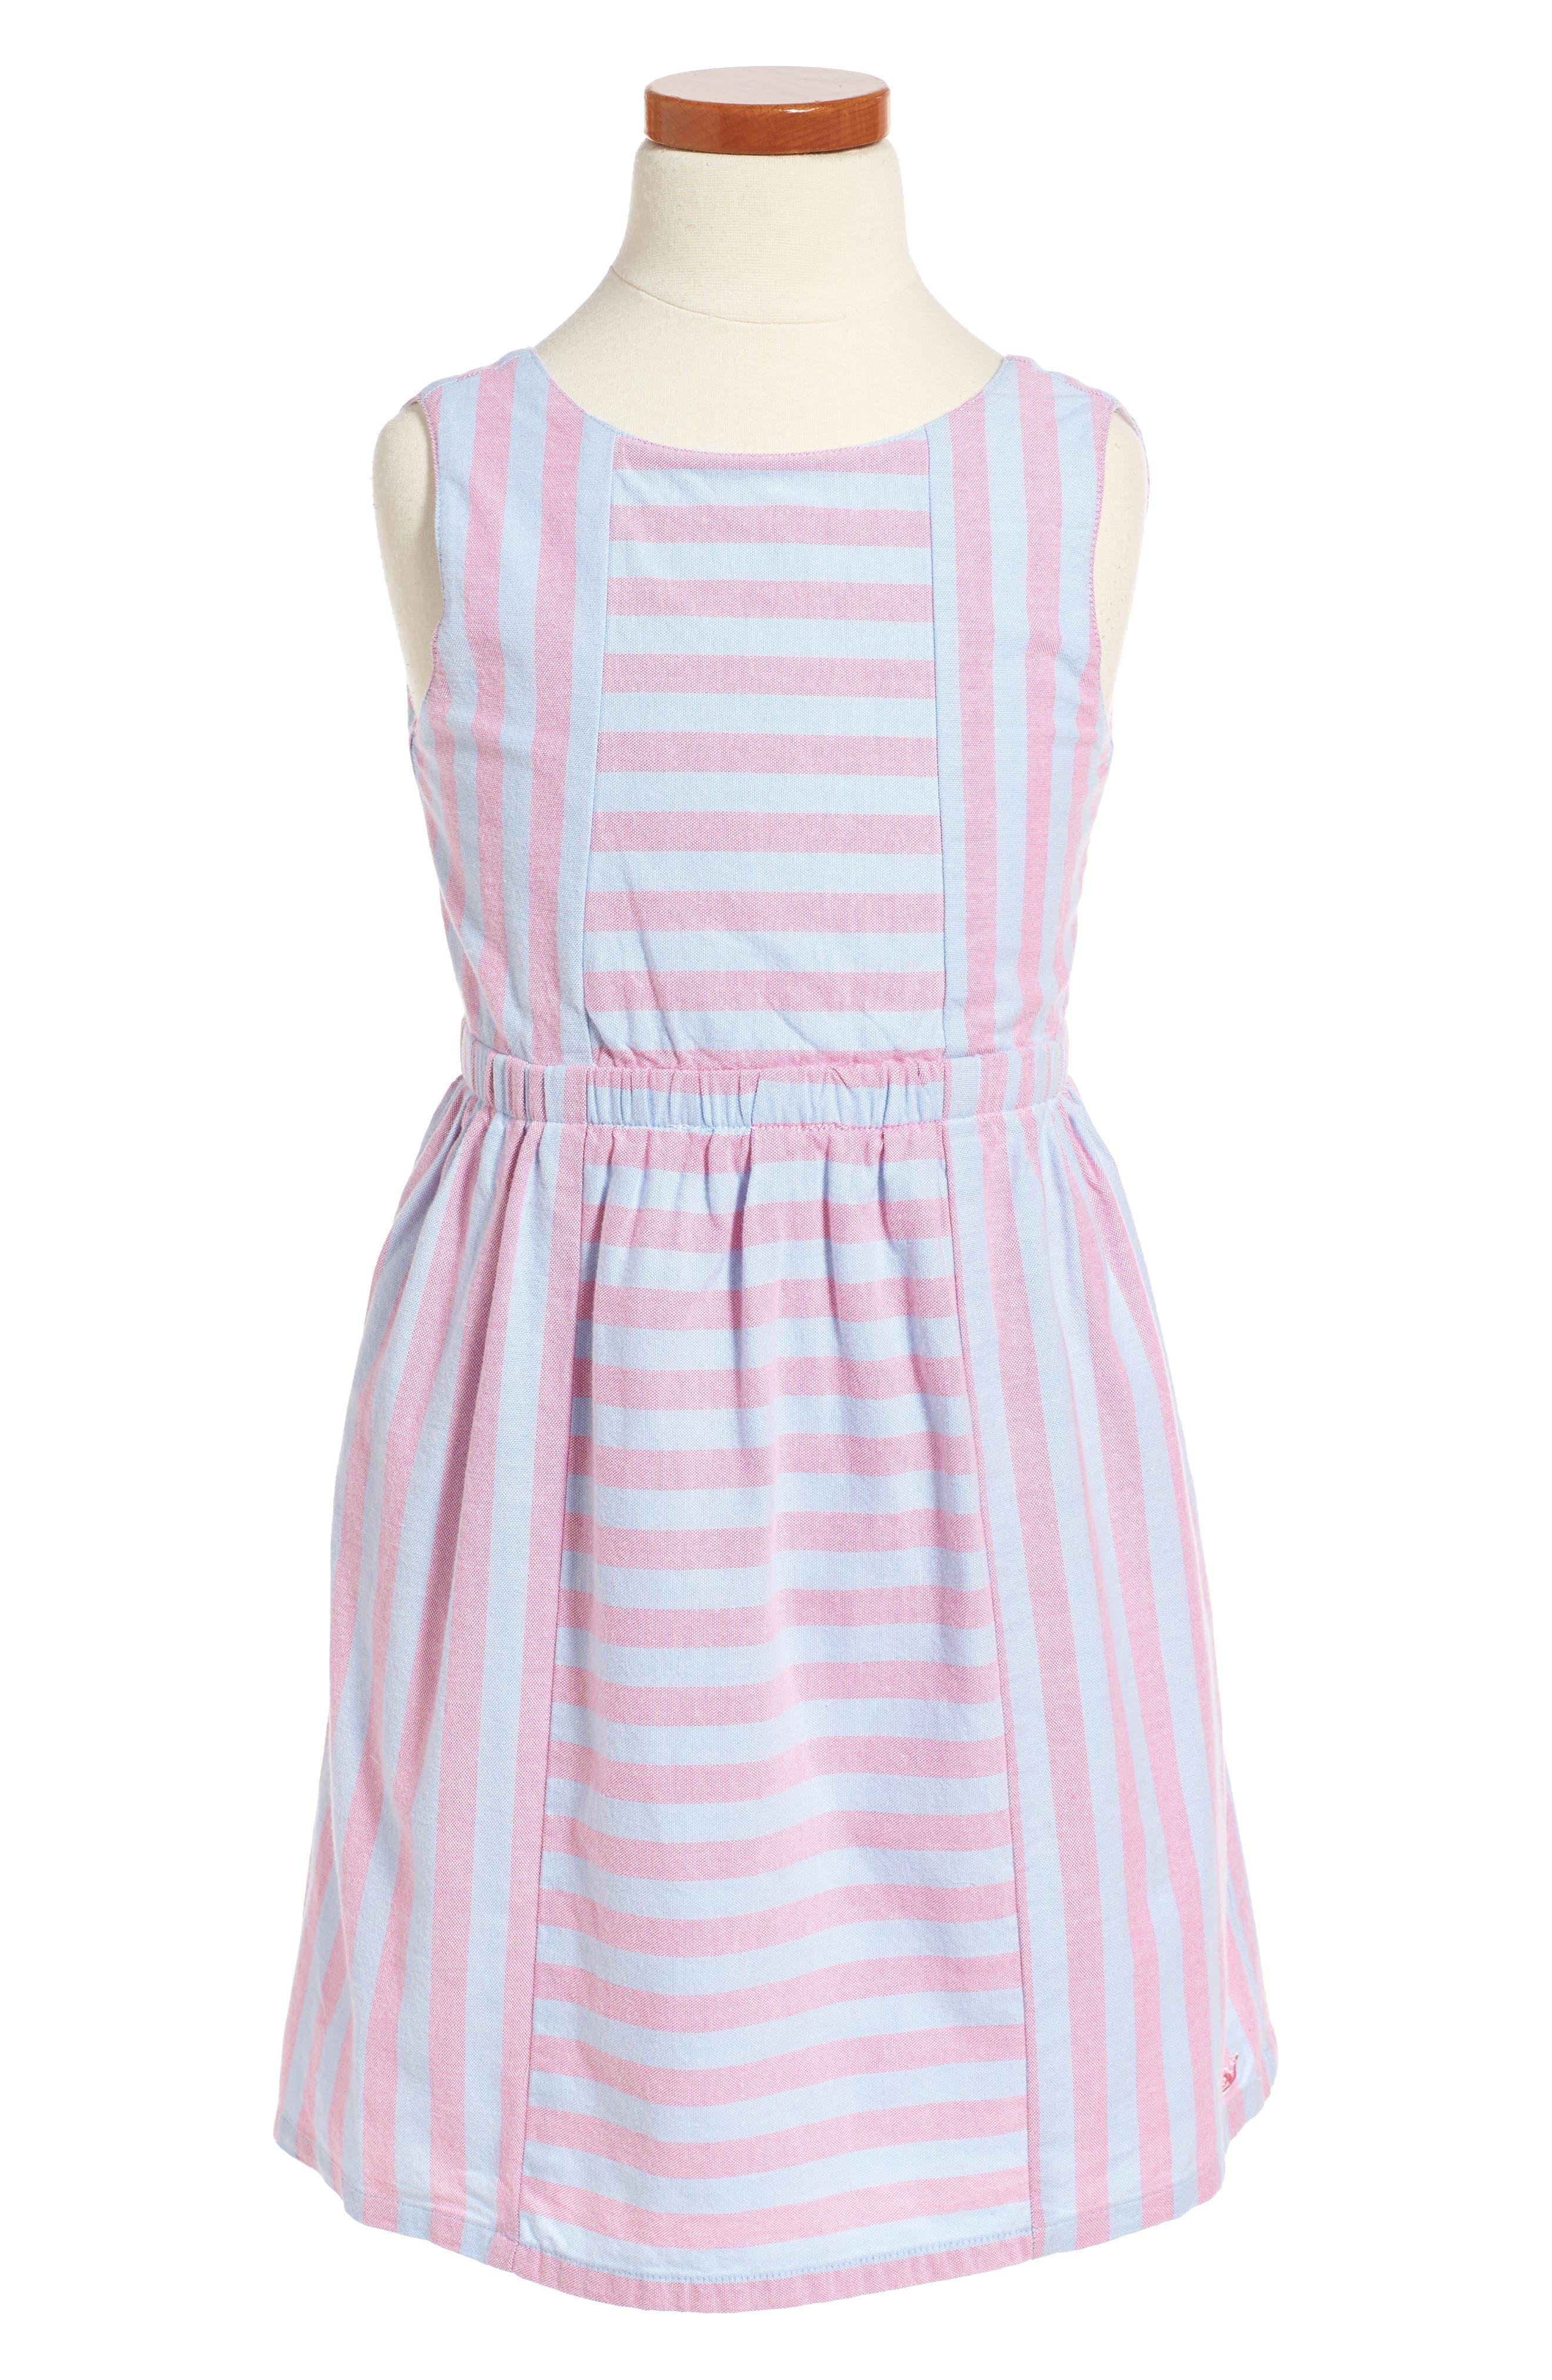 Coastside Stripe Dress,                         Main,                         color, Light Magenta